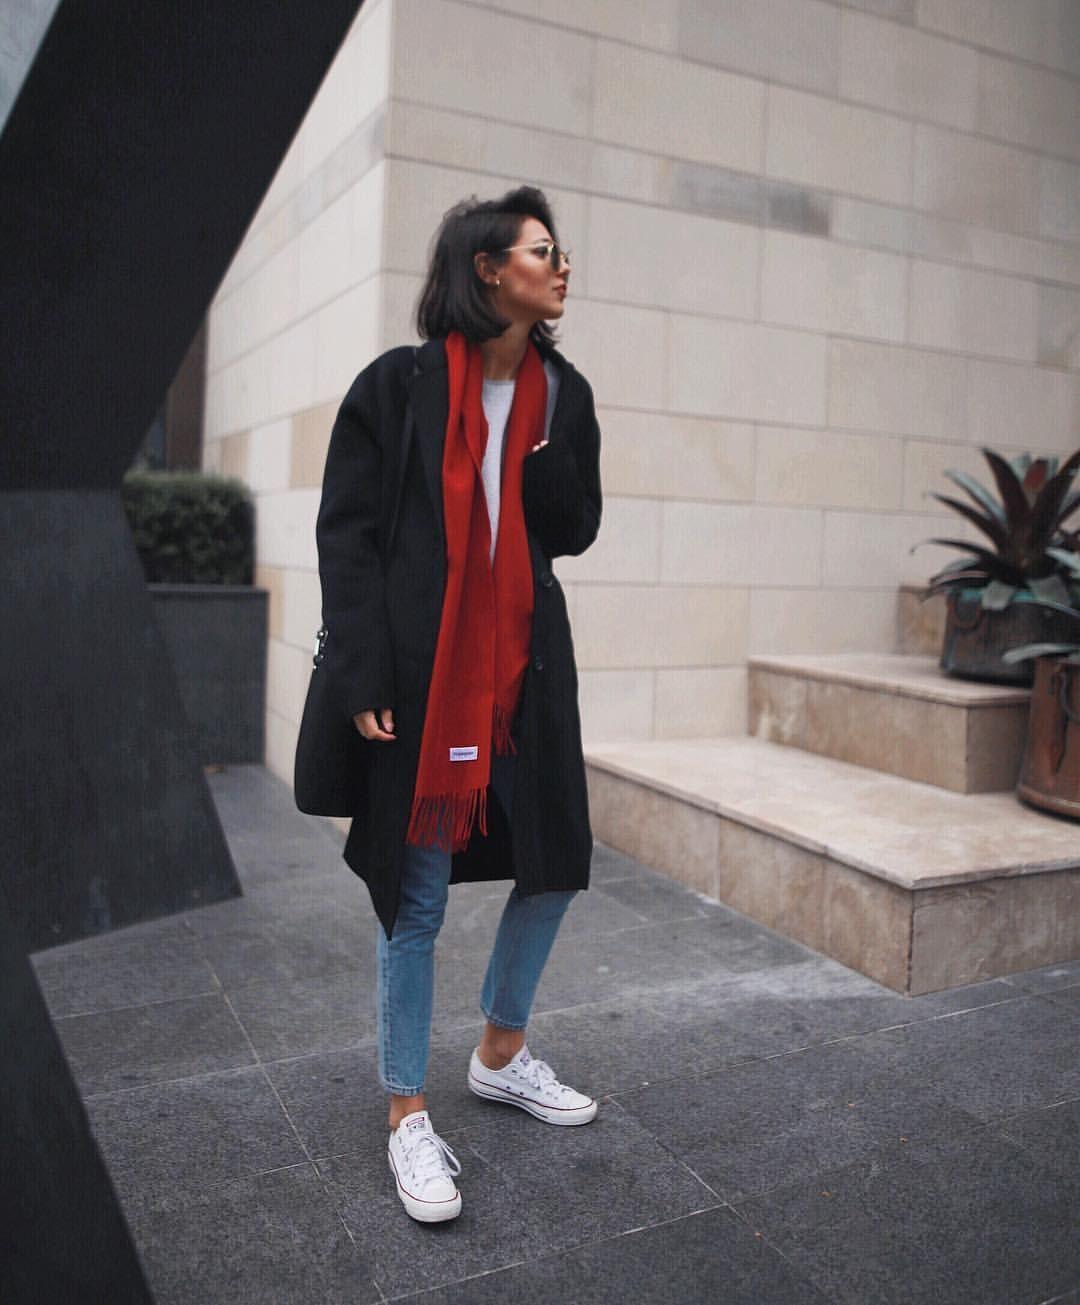 cde08d57be9 Pin by TVYLV on C o a t o f A r m o u r in 2019 | Fashion, Winter ...